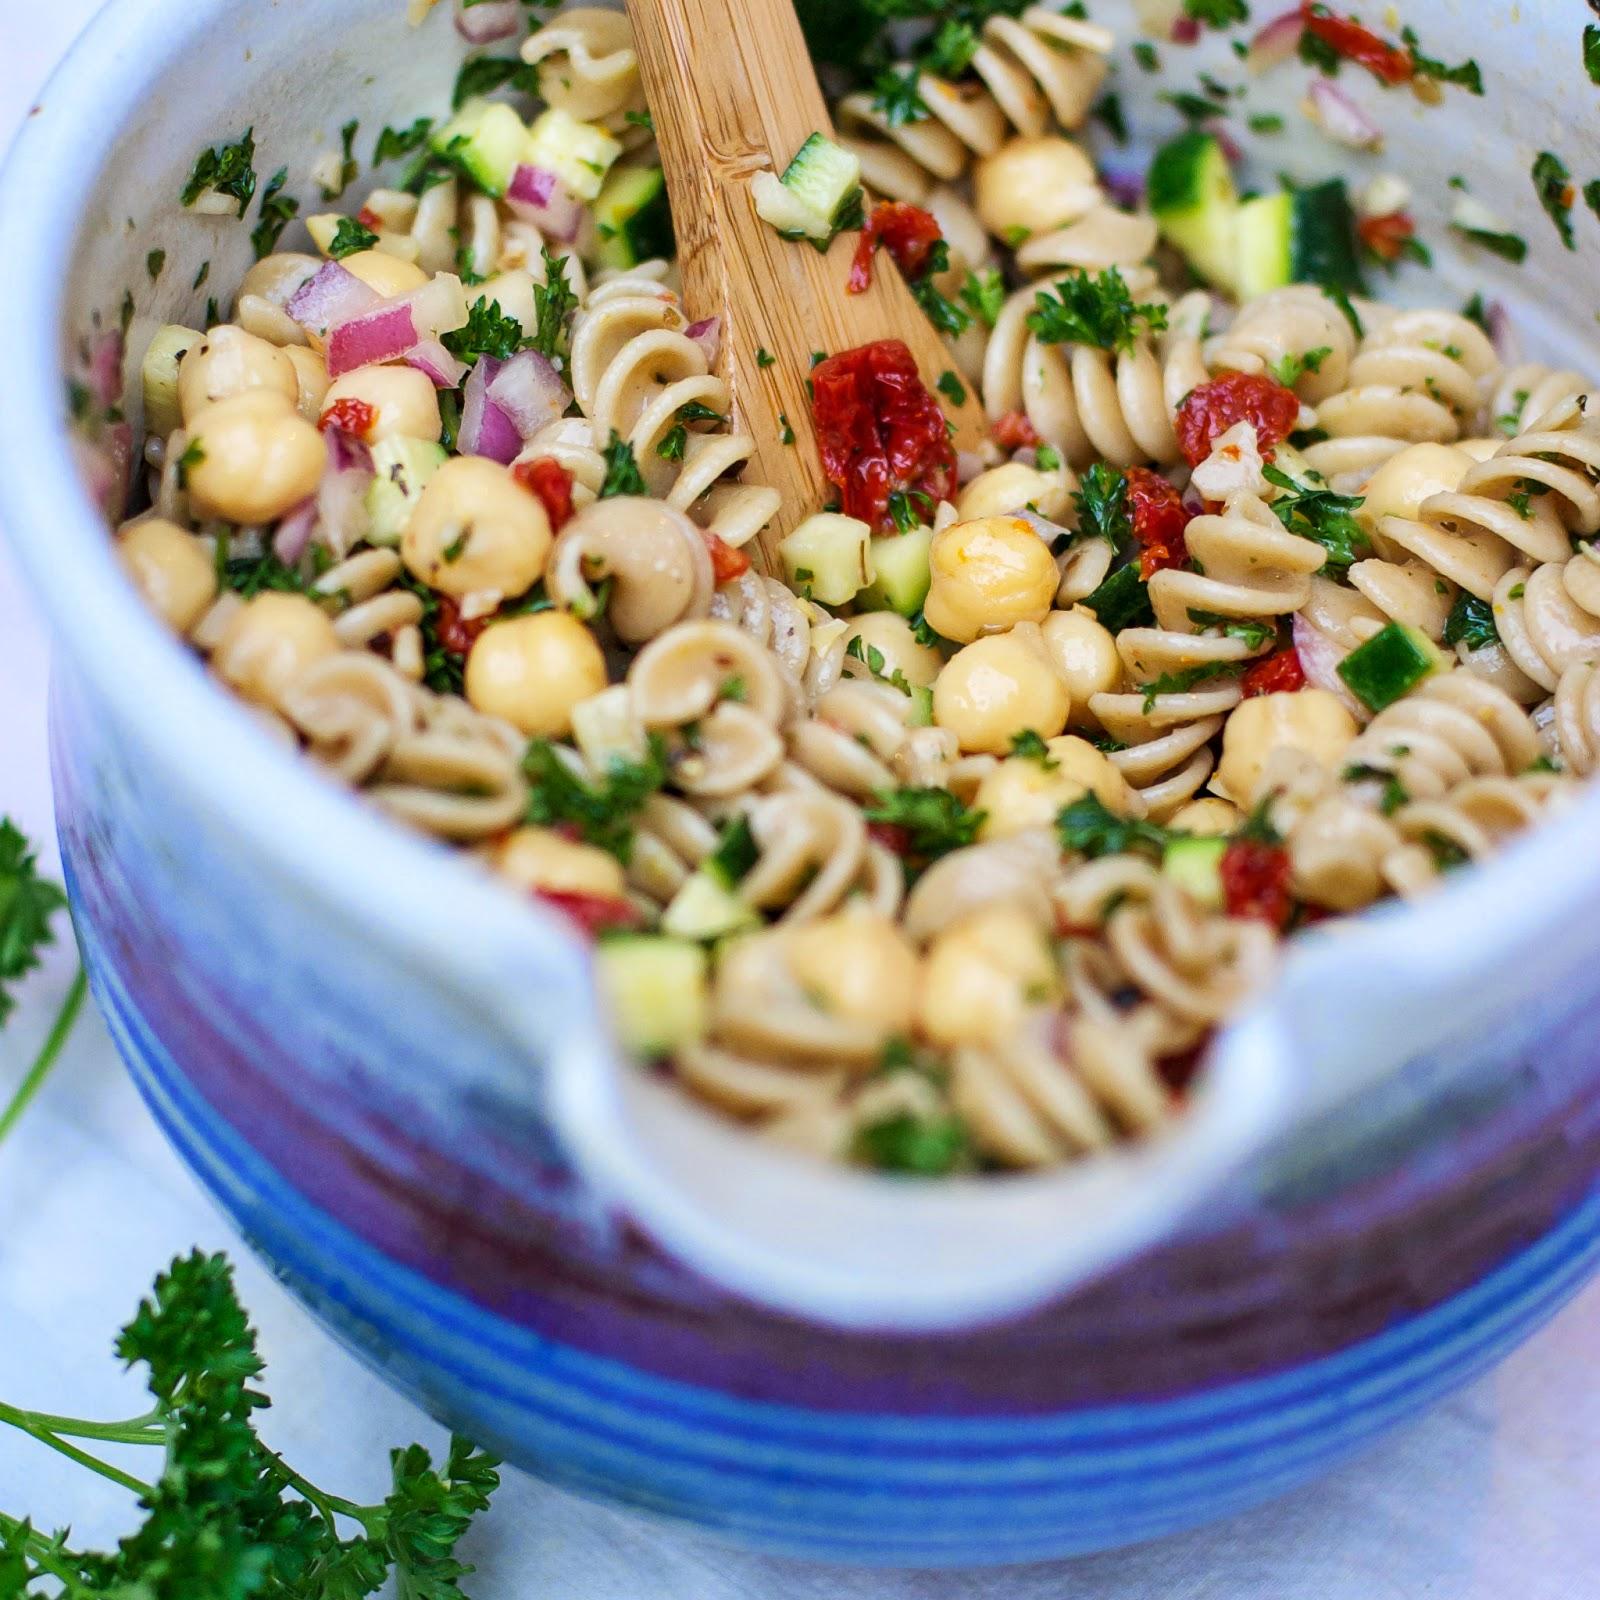 Tuscan Bean And Pasta Salad